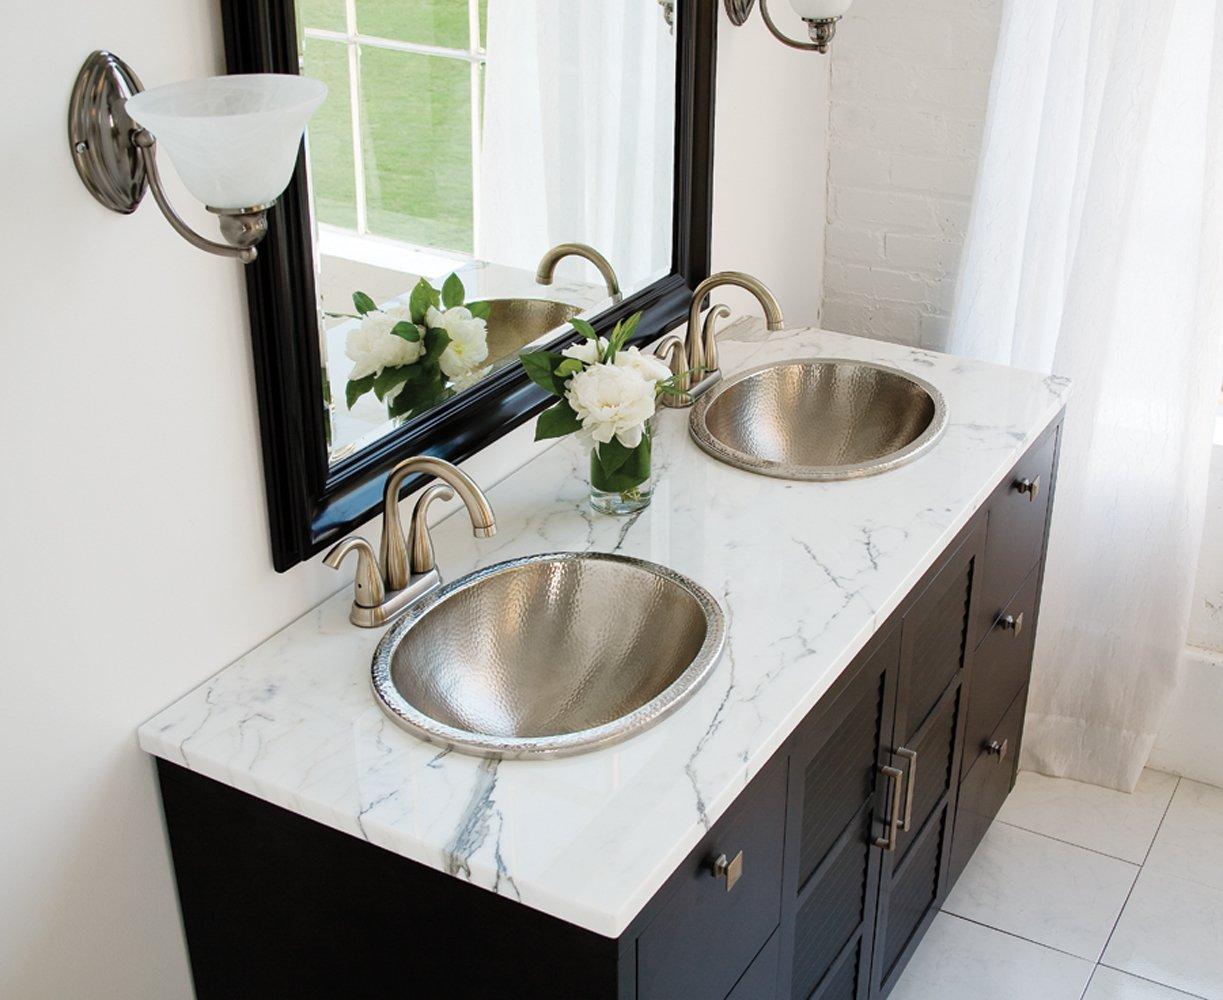 Sinkology SB203-18N Edison Dual Mount Oval Bathroom Sink, 18-0.5 Inch, Hammered Nickel by Sinkology (Image #4)